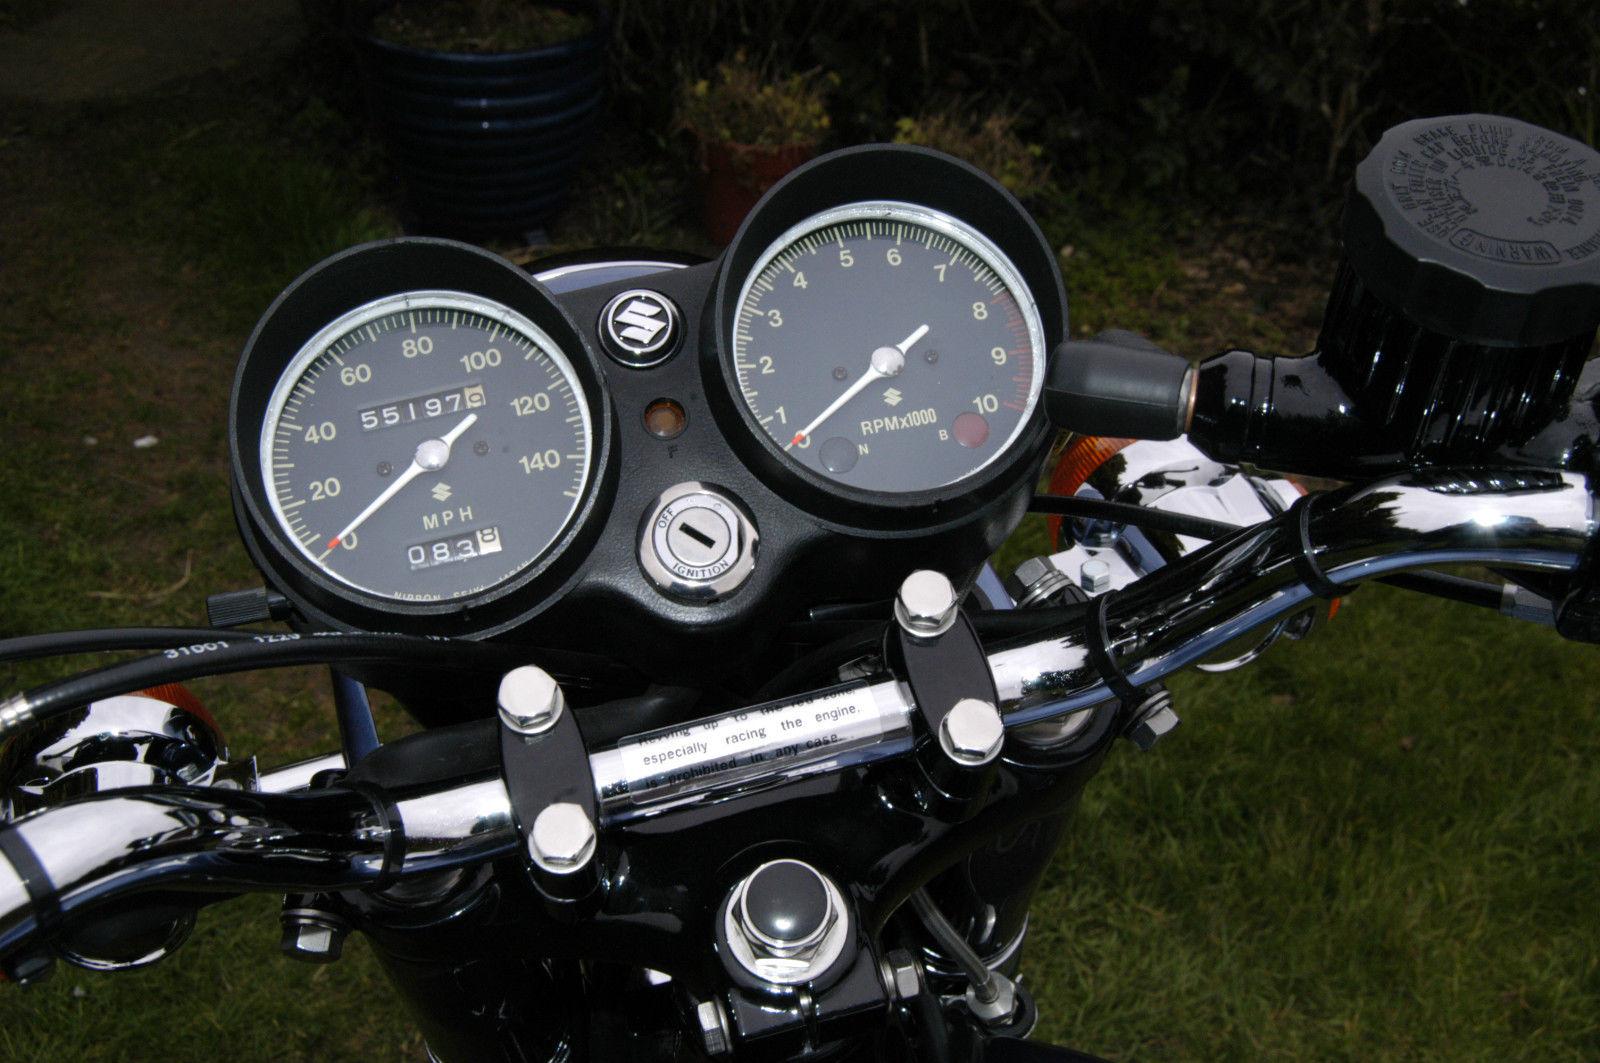 Suzuki GT550 - 1973 - Speedo and Tacho, Clocks, Handlebars, Ignition Switch  and